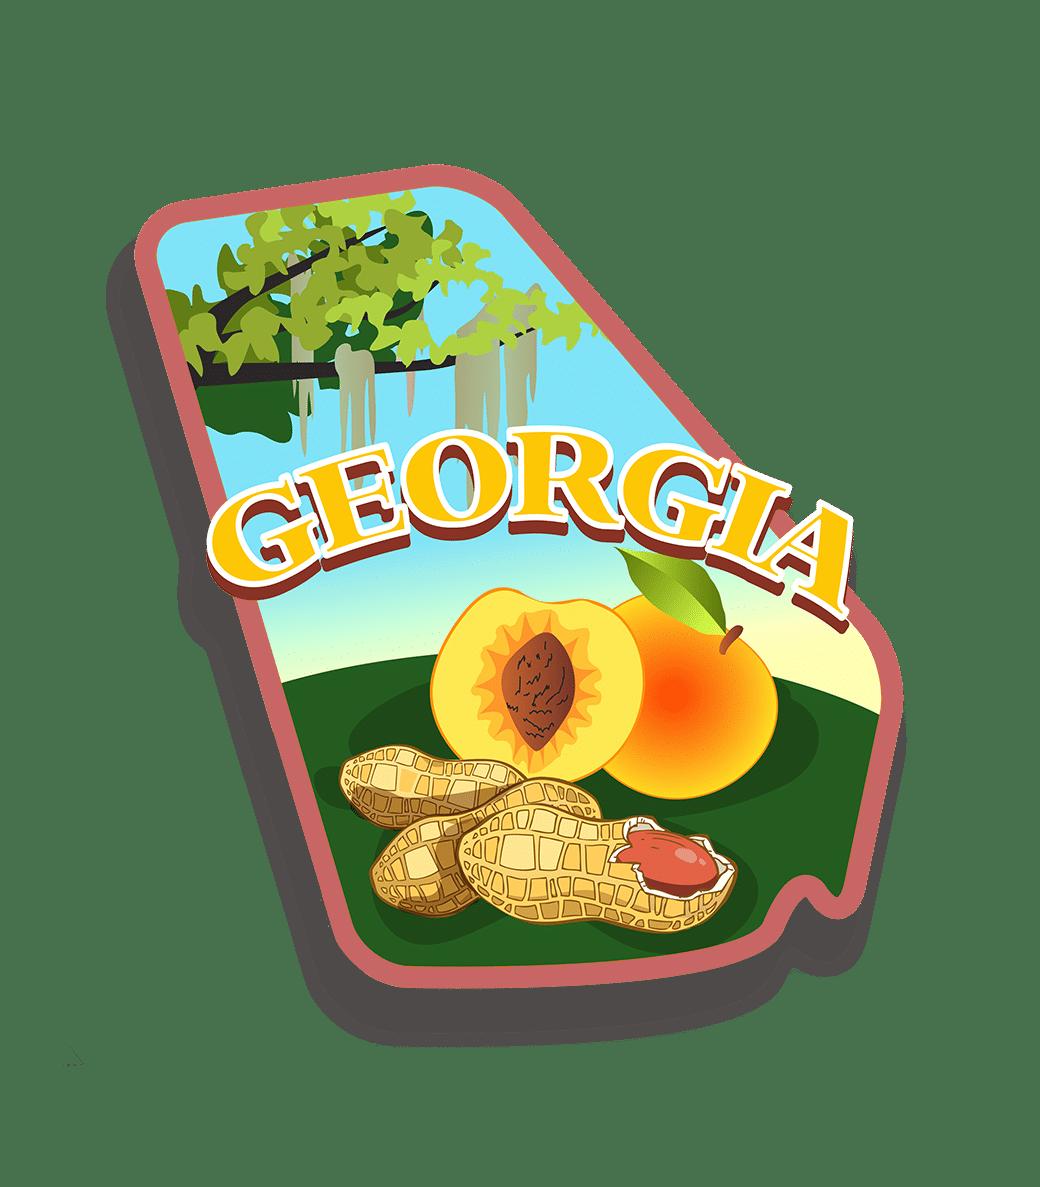 Lawsuit funding in Georgia